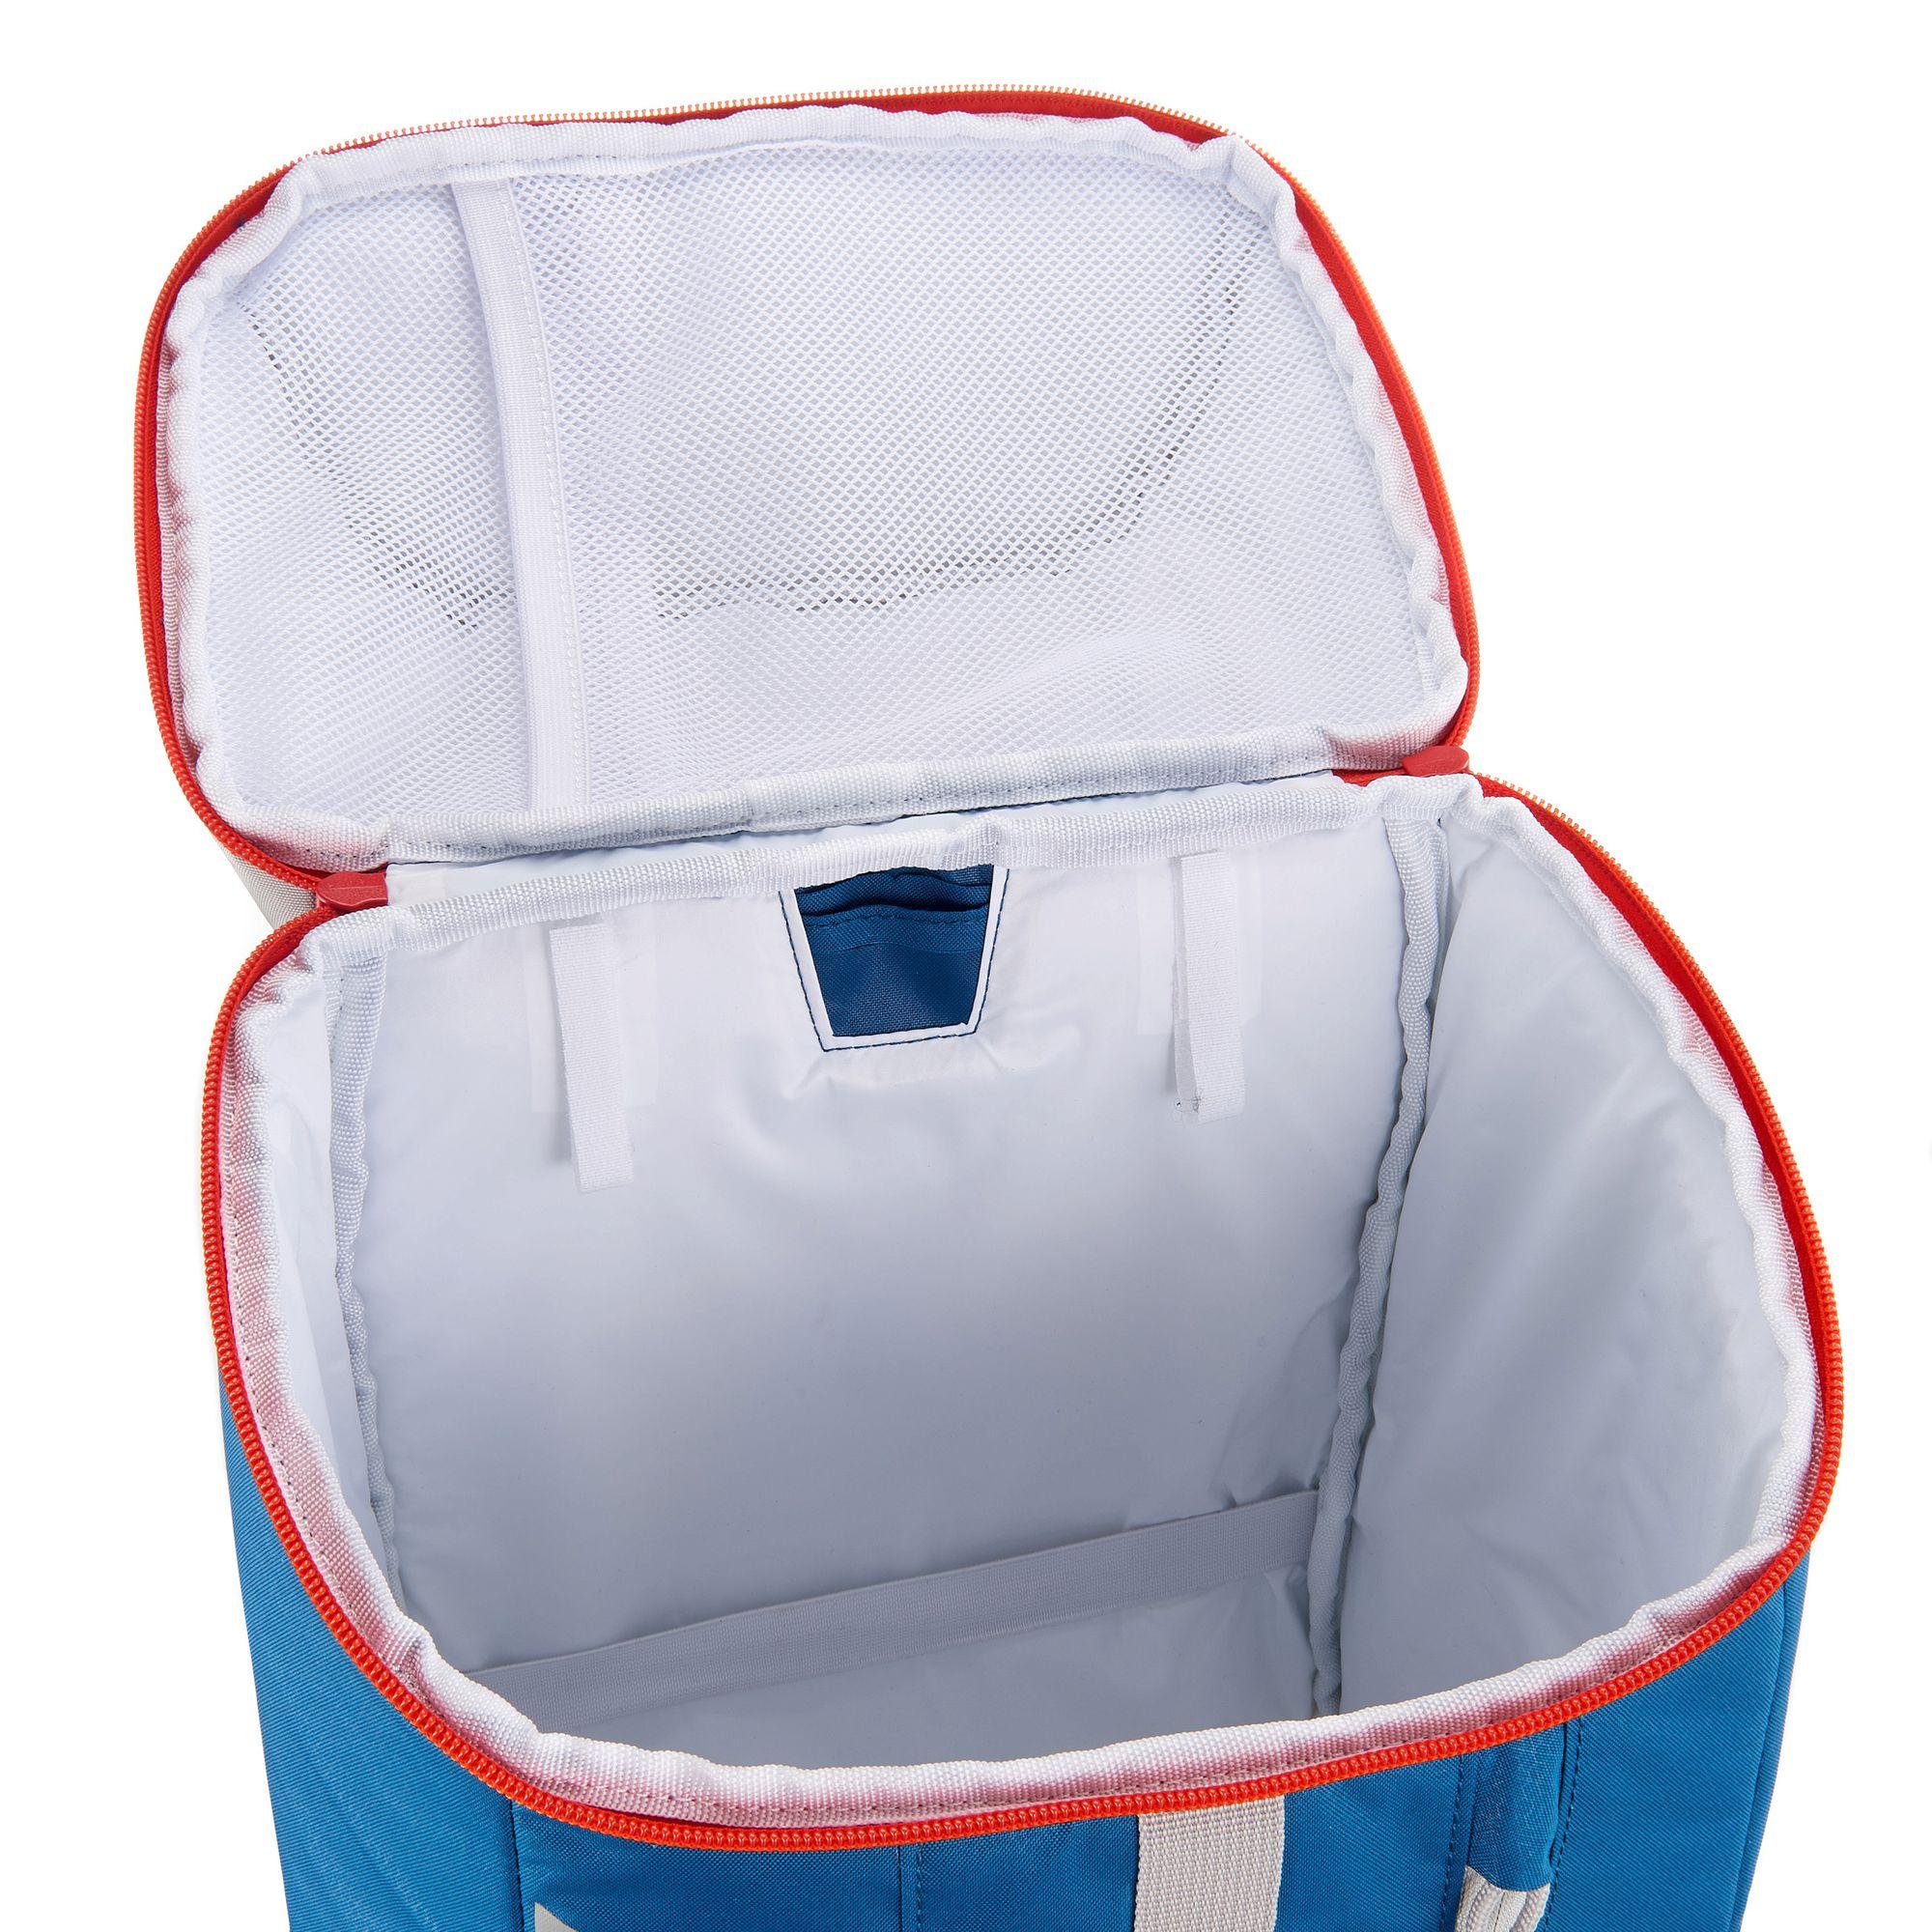 sac a dos glaciere randonnee nature 20 l bleu clubs collectivit s decathlon pro. Black Bedroom Furniture Sets. Home Design Ideas